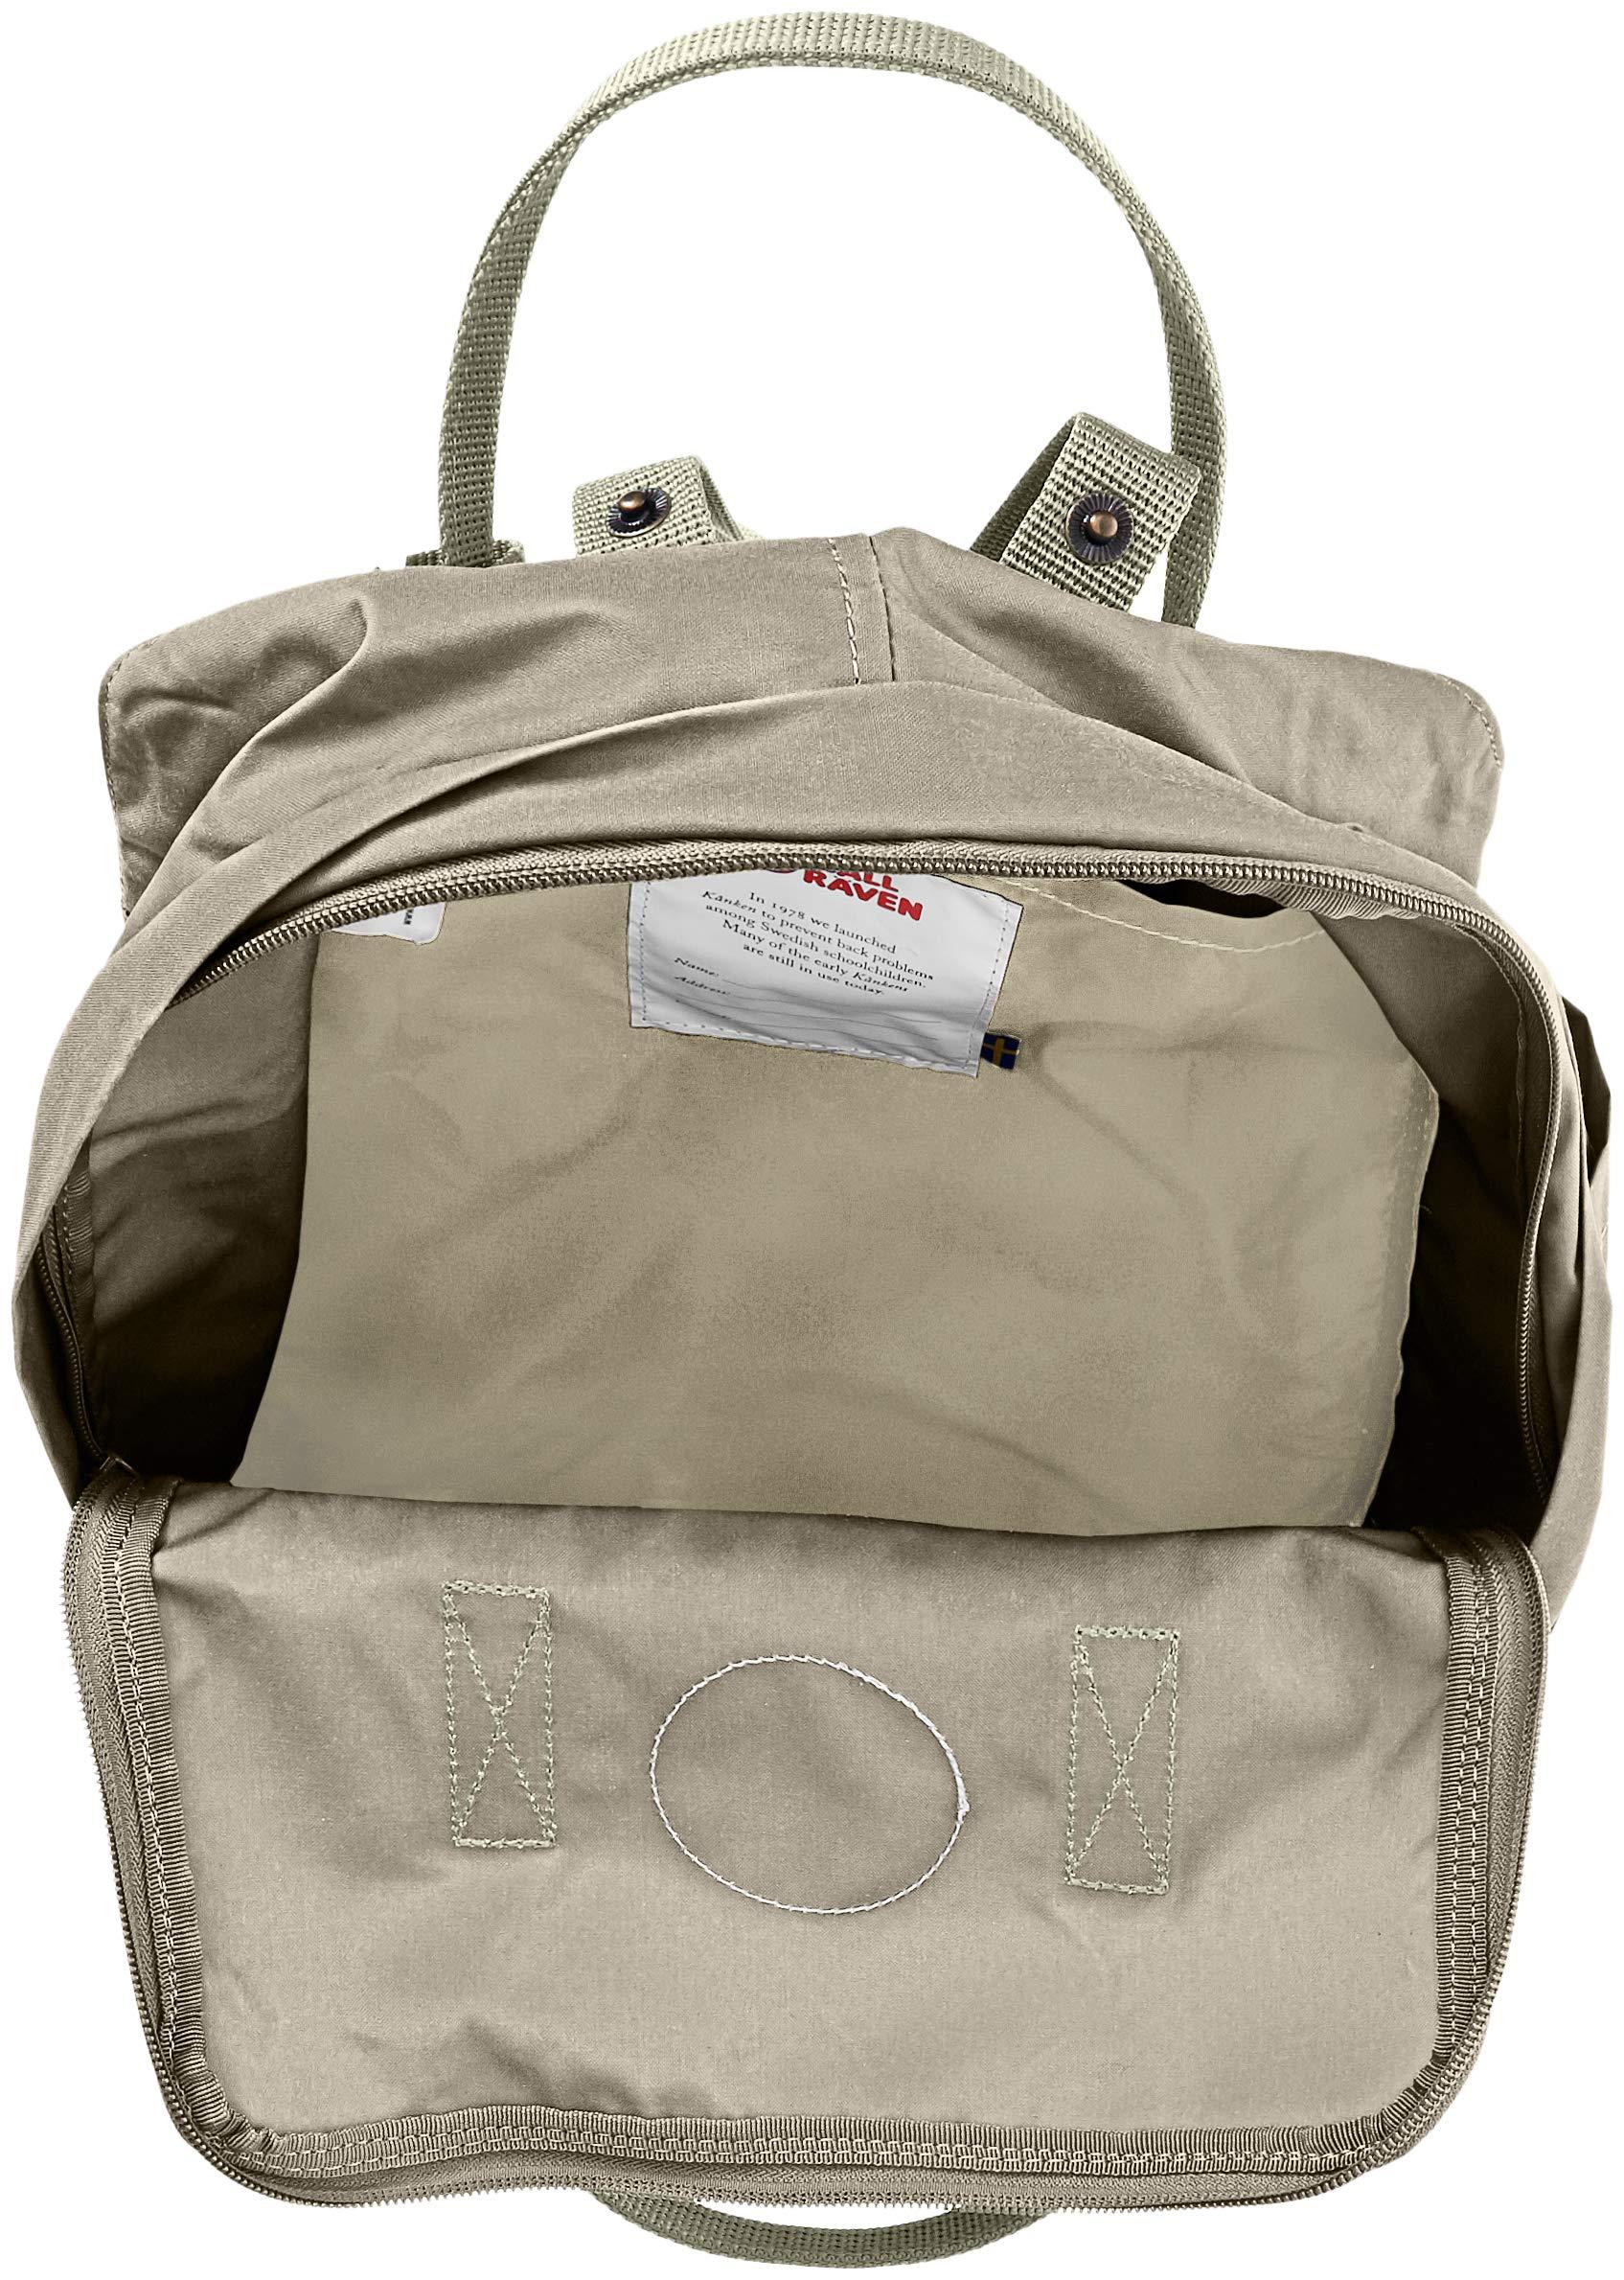 Fjallraven Kanken Classic Backpack for Everyday